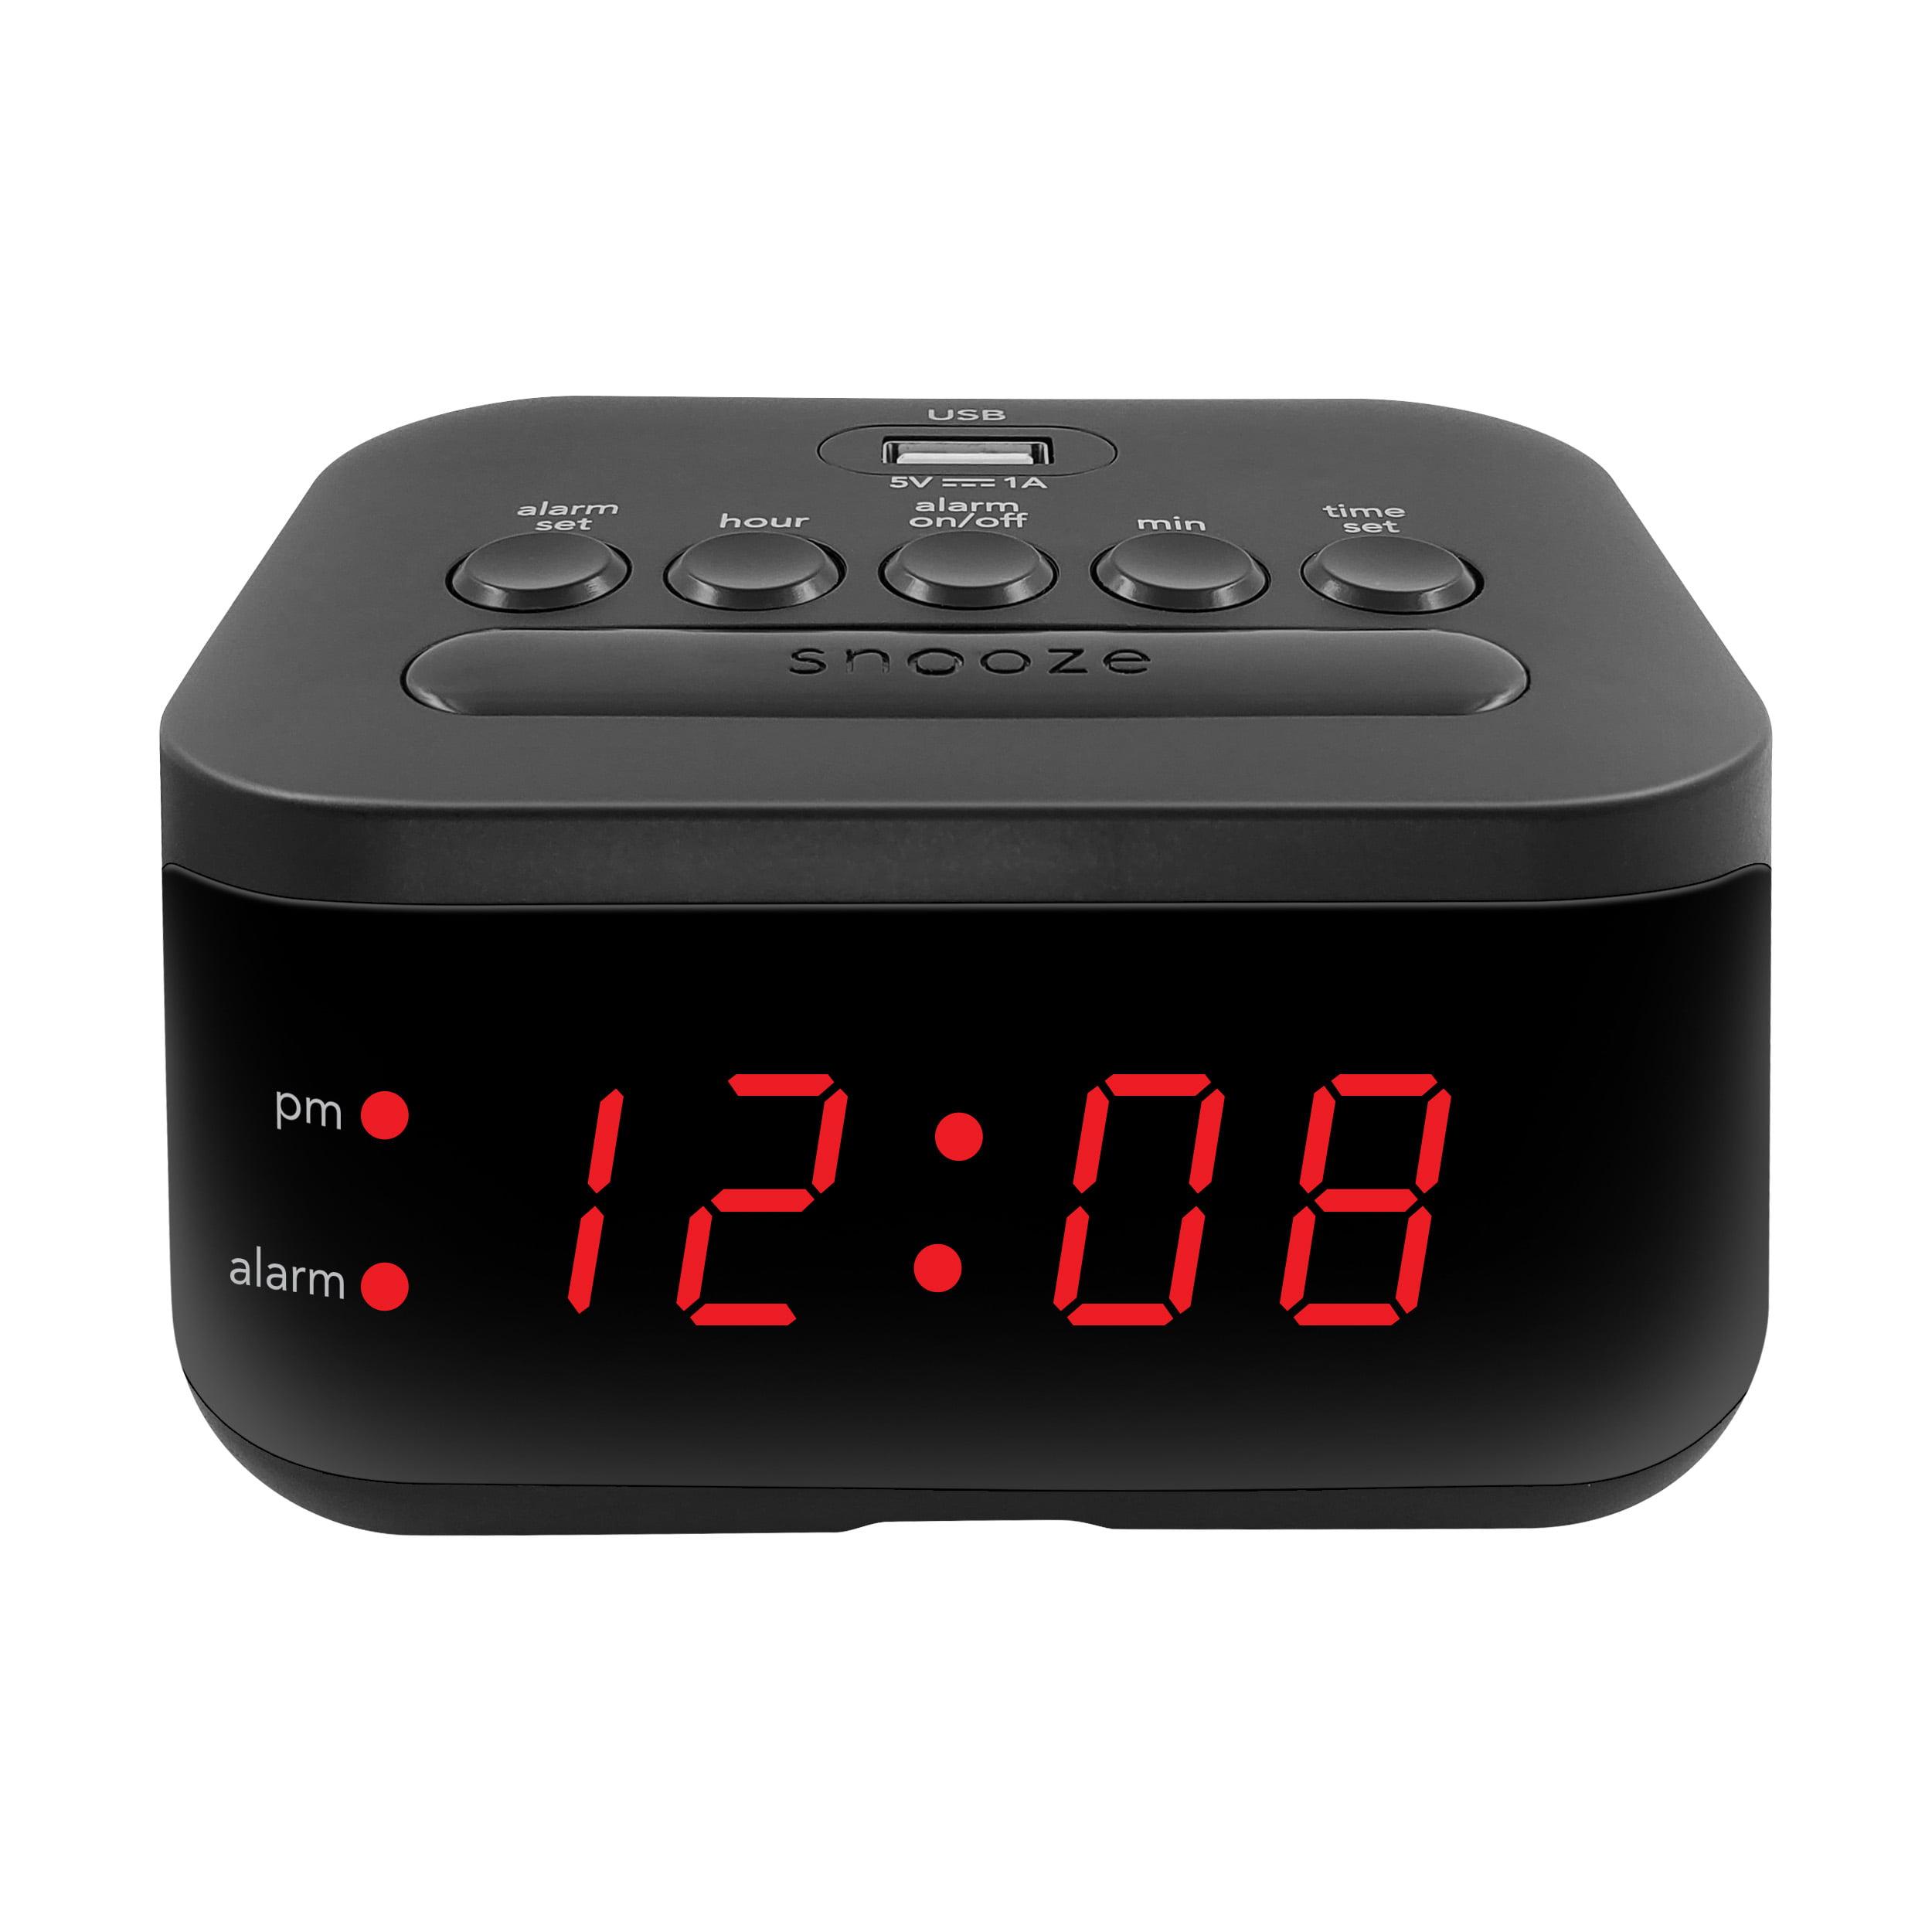 High Speed Dual USB Ports Big White Digital Display Snooze LICIN LED Digital Alarm Clock,Dual Alarm 5 Preset FM /& DAB Stations Optional Alarm Sounds And Volume for Home Bedroom Decor.